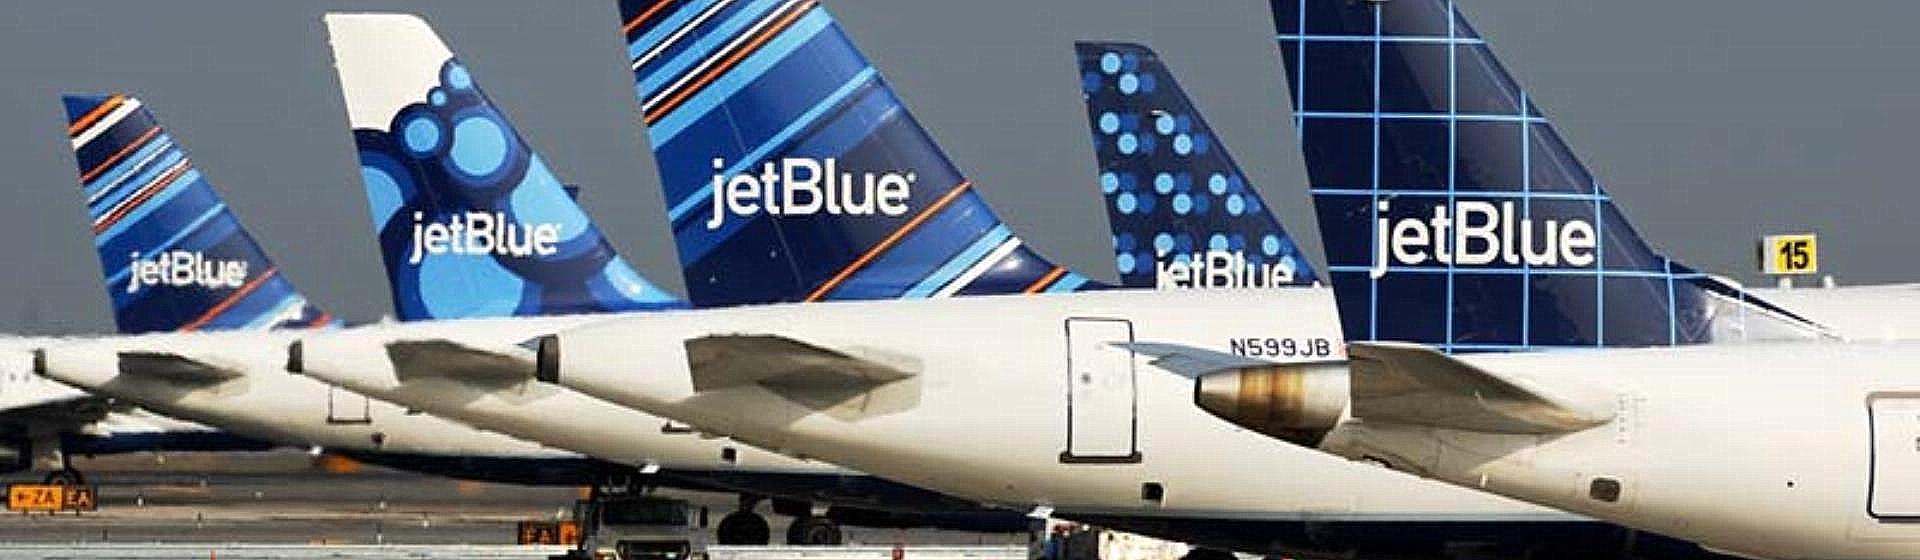 JetBlue Plane tails.